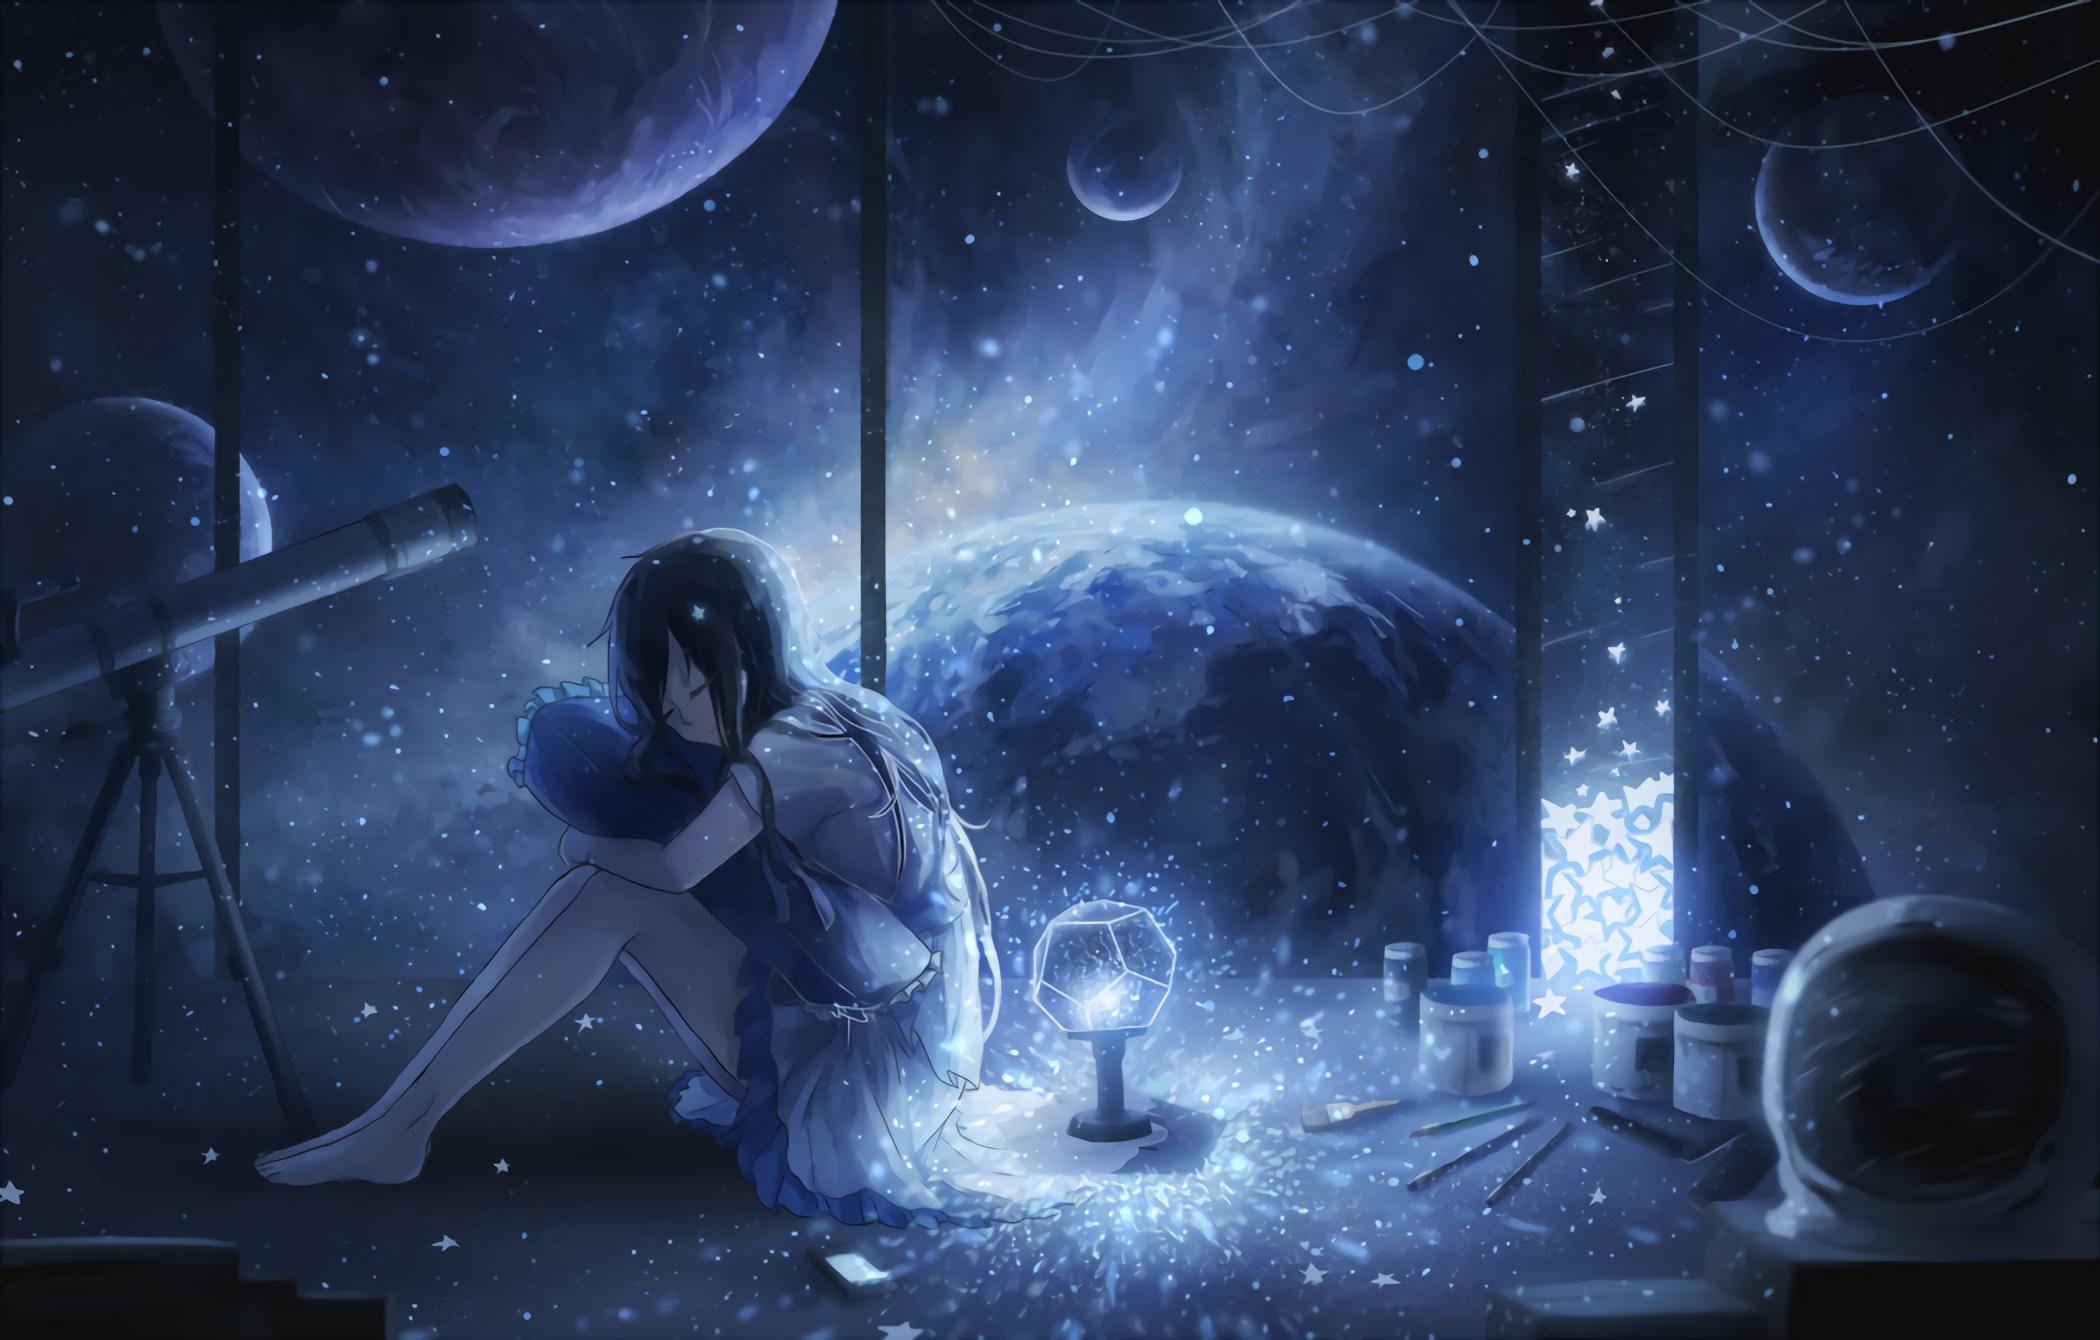 Anime 2100x1340 manga anime anime girls space planetarium telescope barefoot feet dark hair long hair black hair dress white dress night planet paintbrushes smiling pillow closed eyes stars